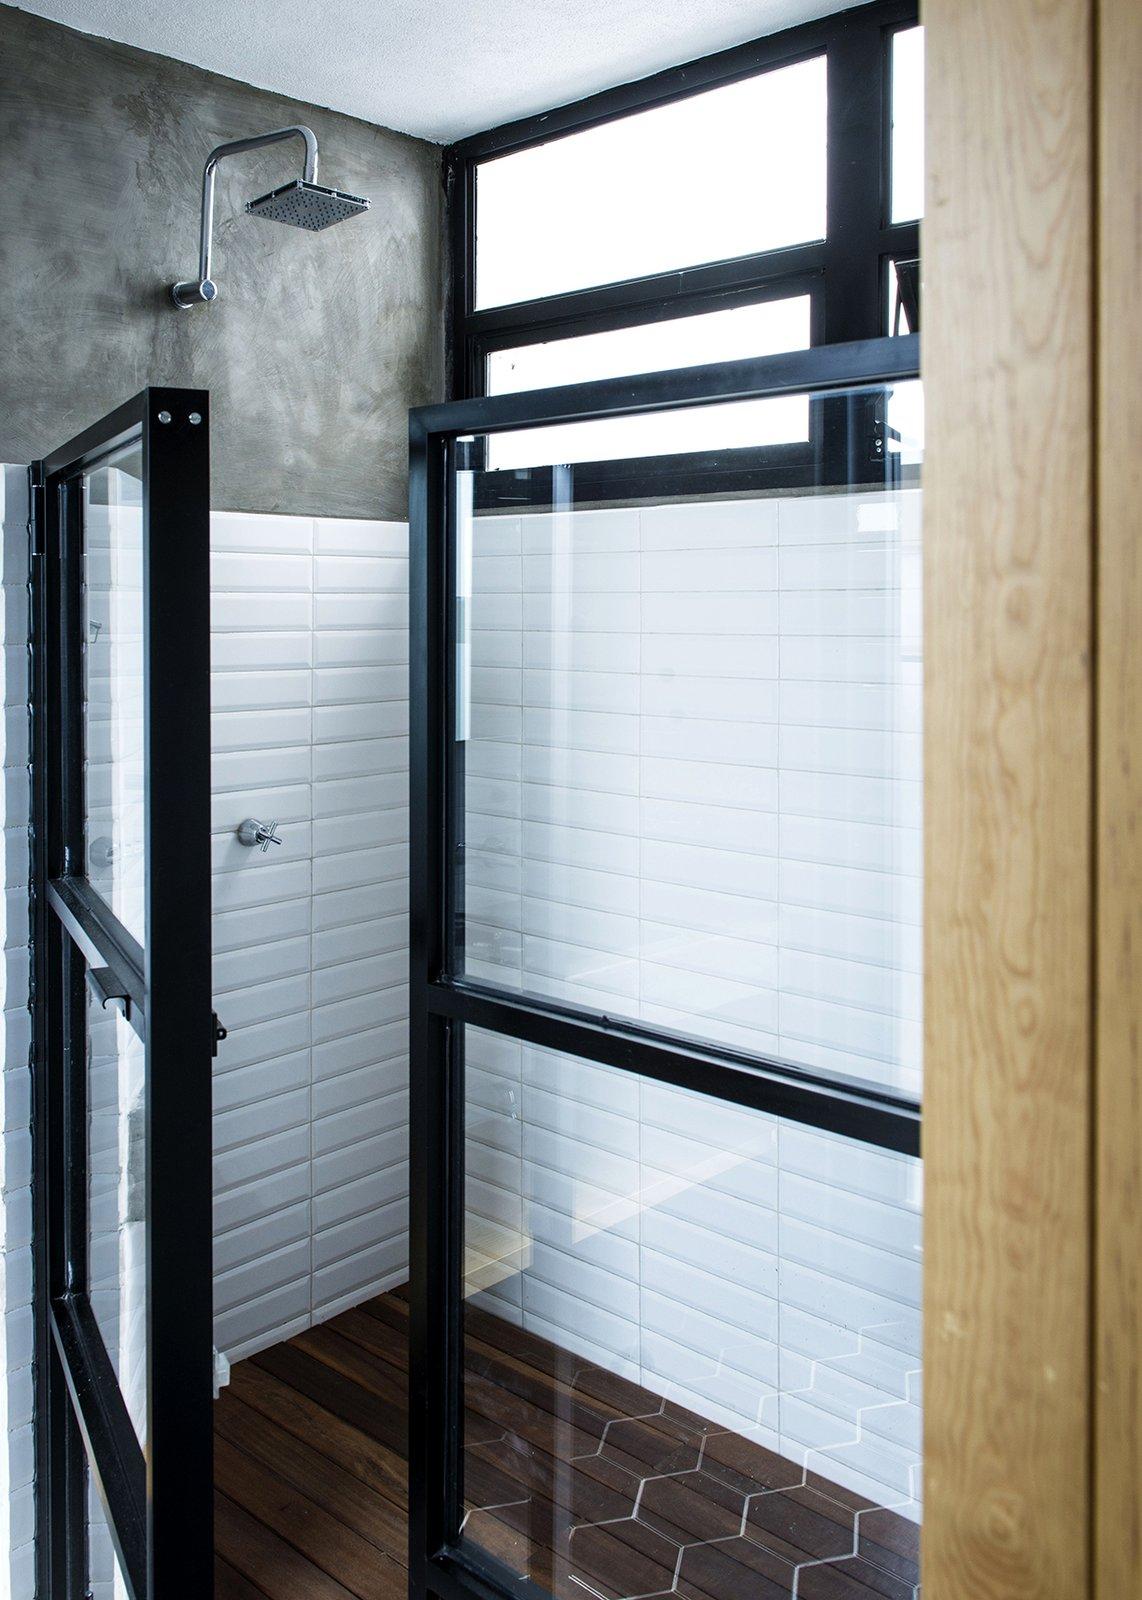 Bath Room, Ceramic Tile Floor, Subway Tile Wall, and Enclosed Shower Main Bathroom - Shower  Casa MA by e arquitectos